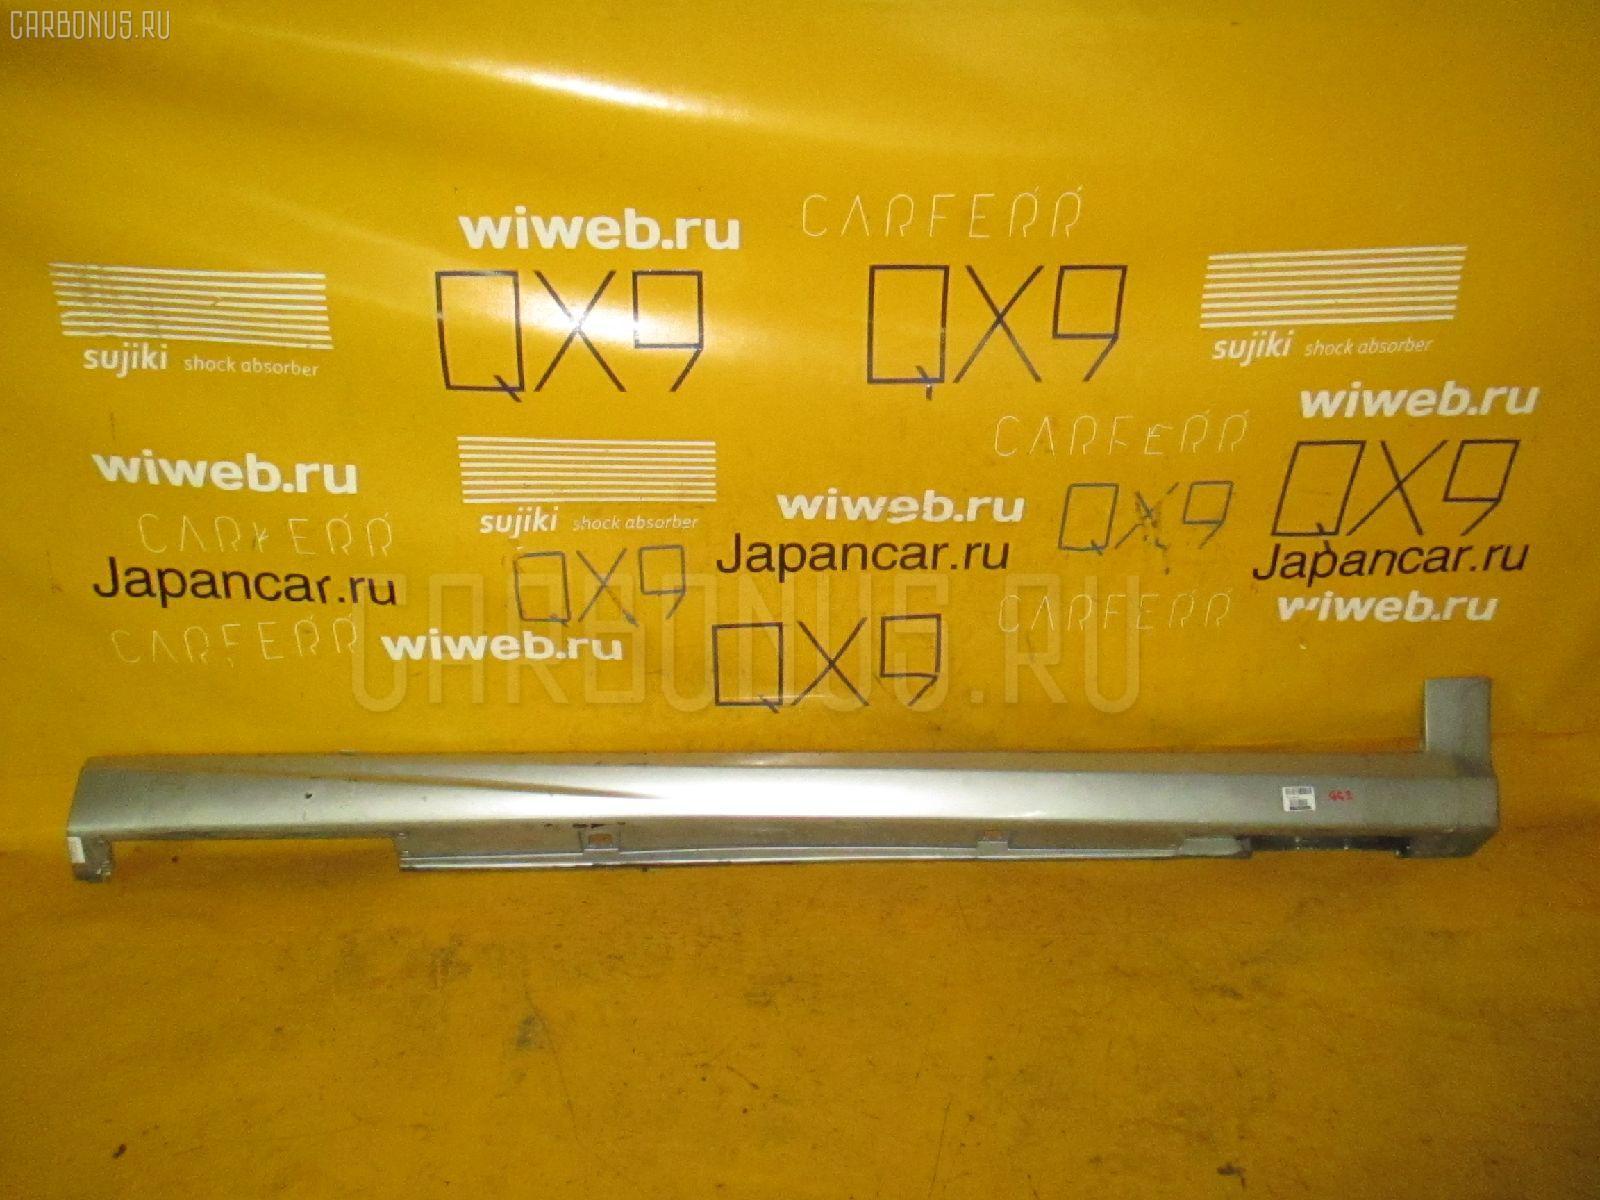 Порог кузова пластиковый ( обвес ) SUBARU IMPREZA WAGON GG2. Фото 4